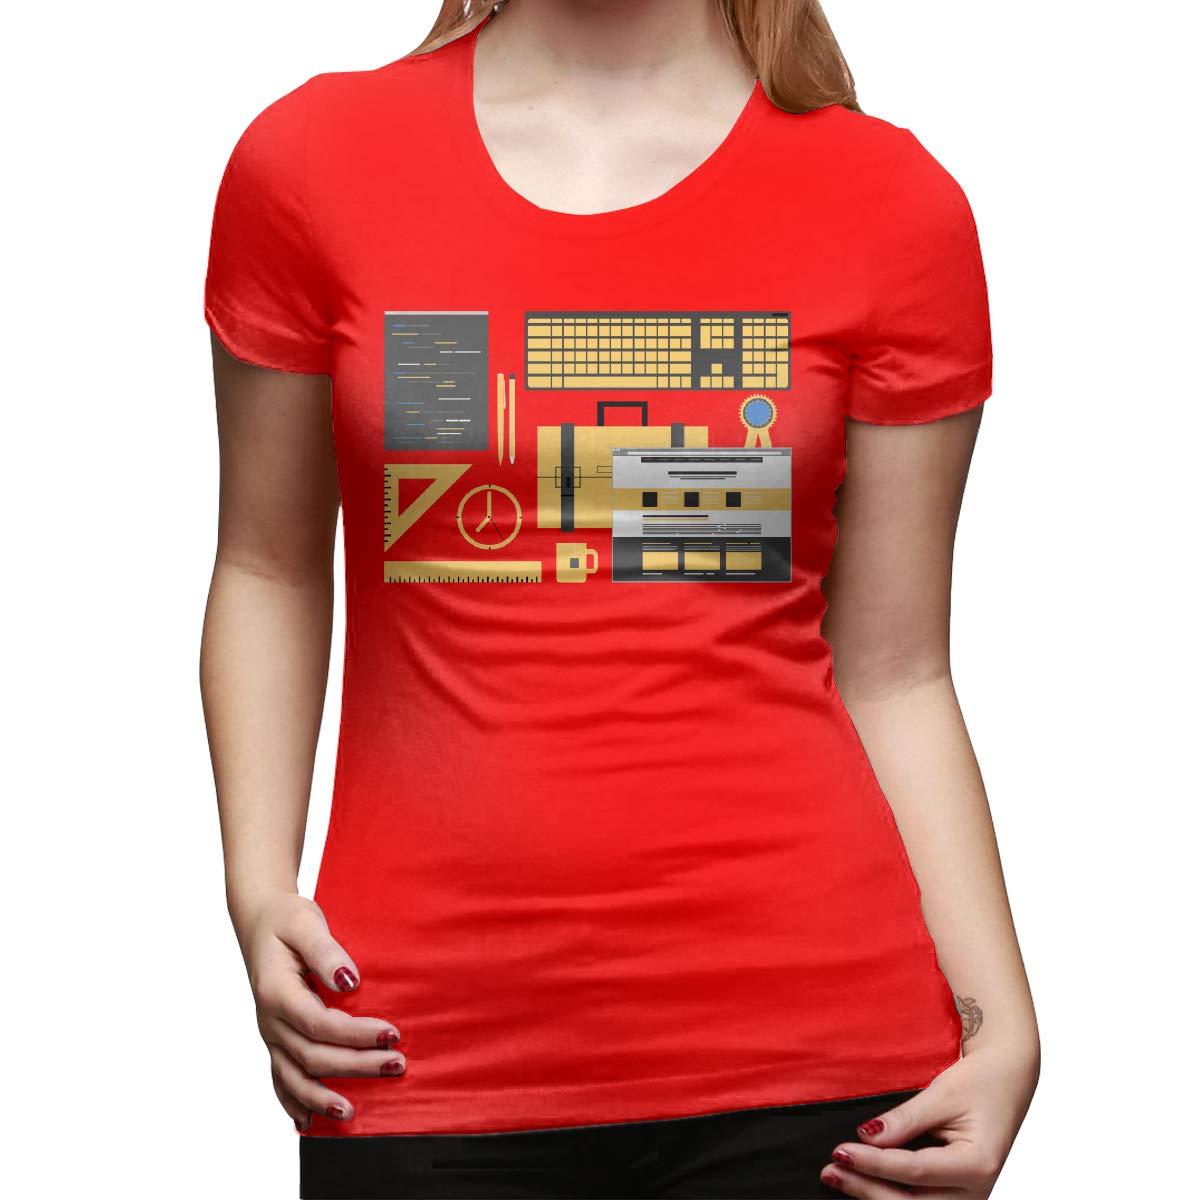 Lisa Hansen Web Design Womens Short Sleeve T Shirt Color Red Size 32